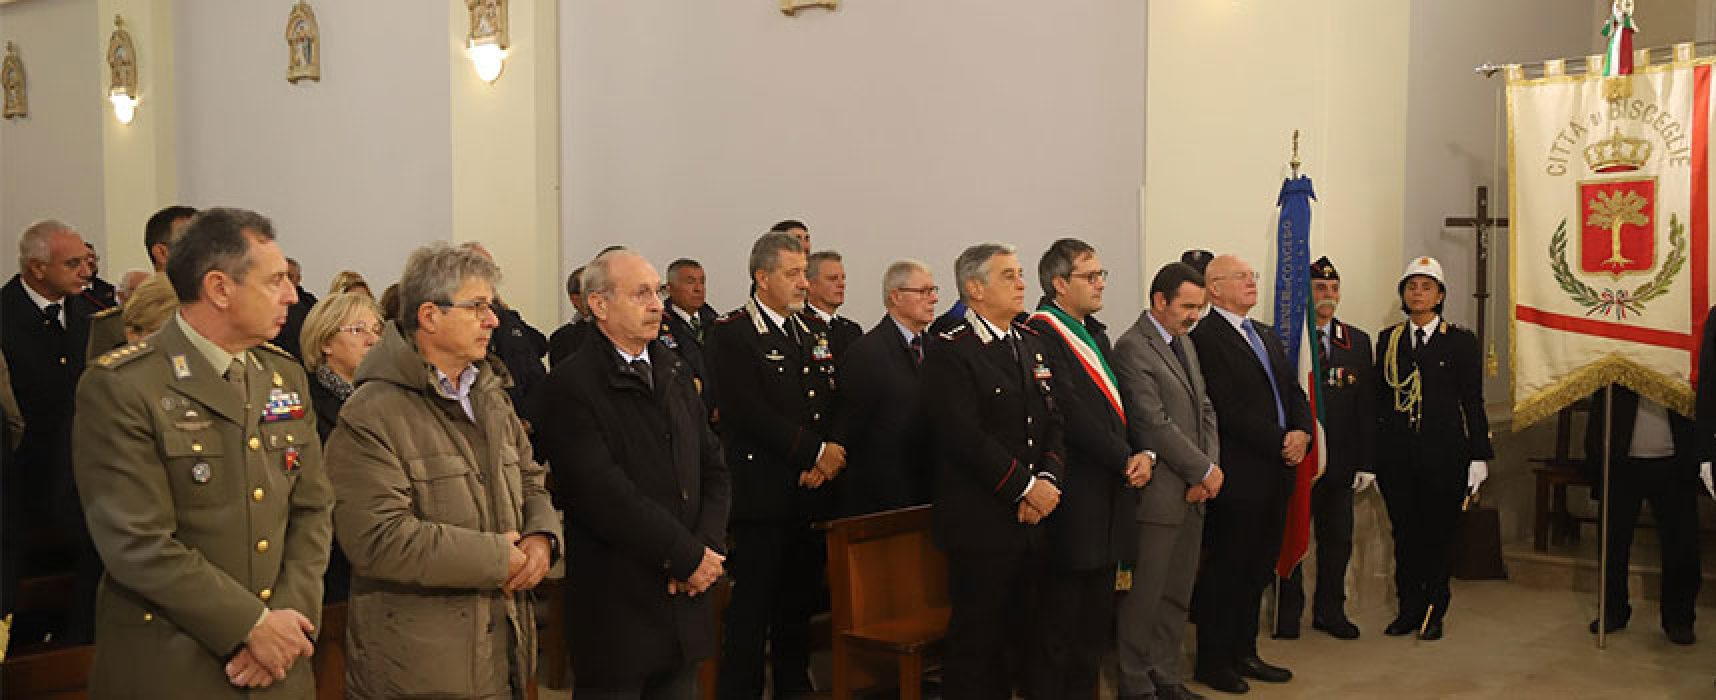 "Sindaco Angarano: ""Profondamente grati a Carlo De Trizio e Pierdavide De Cillis"" / FOTO"